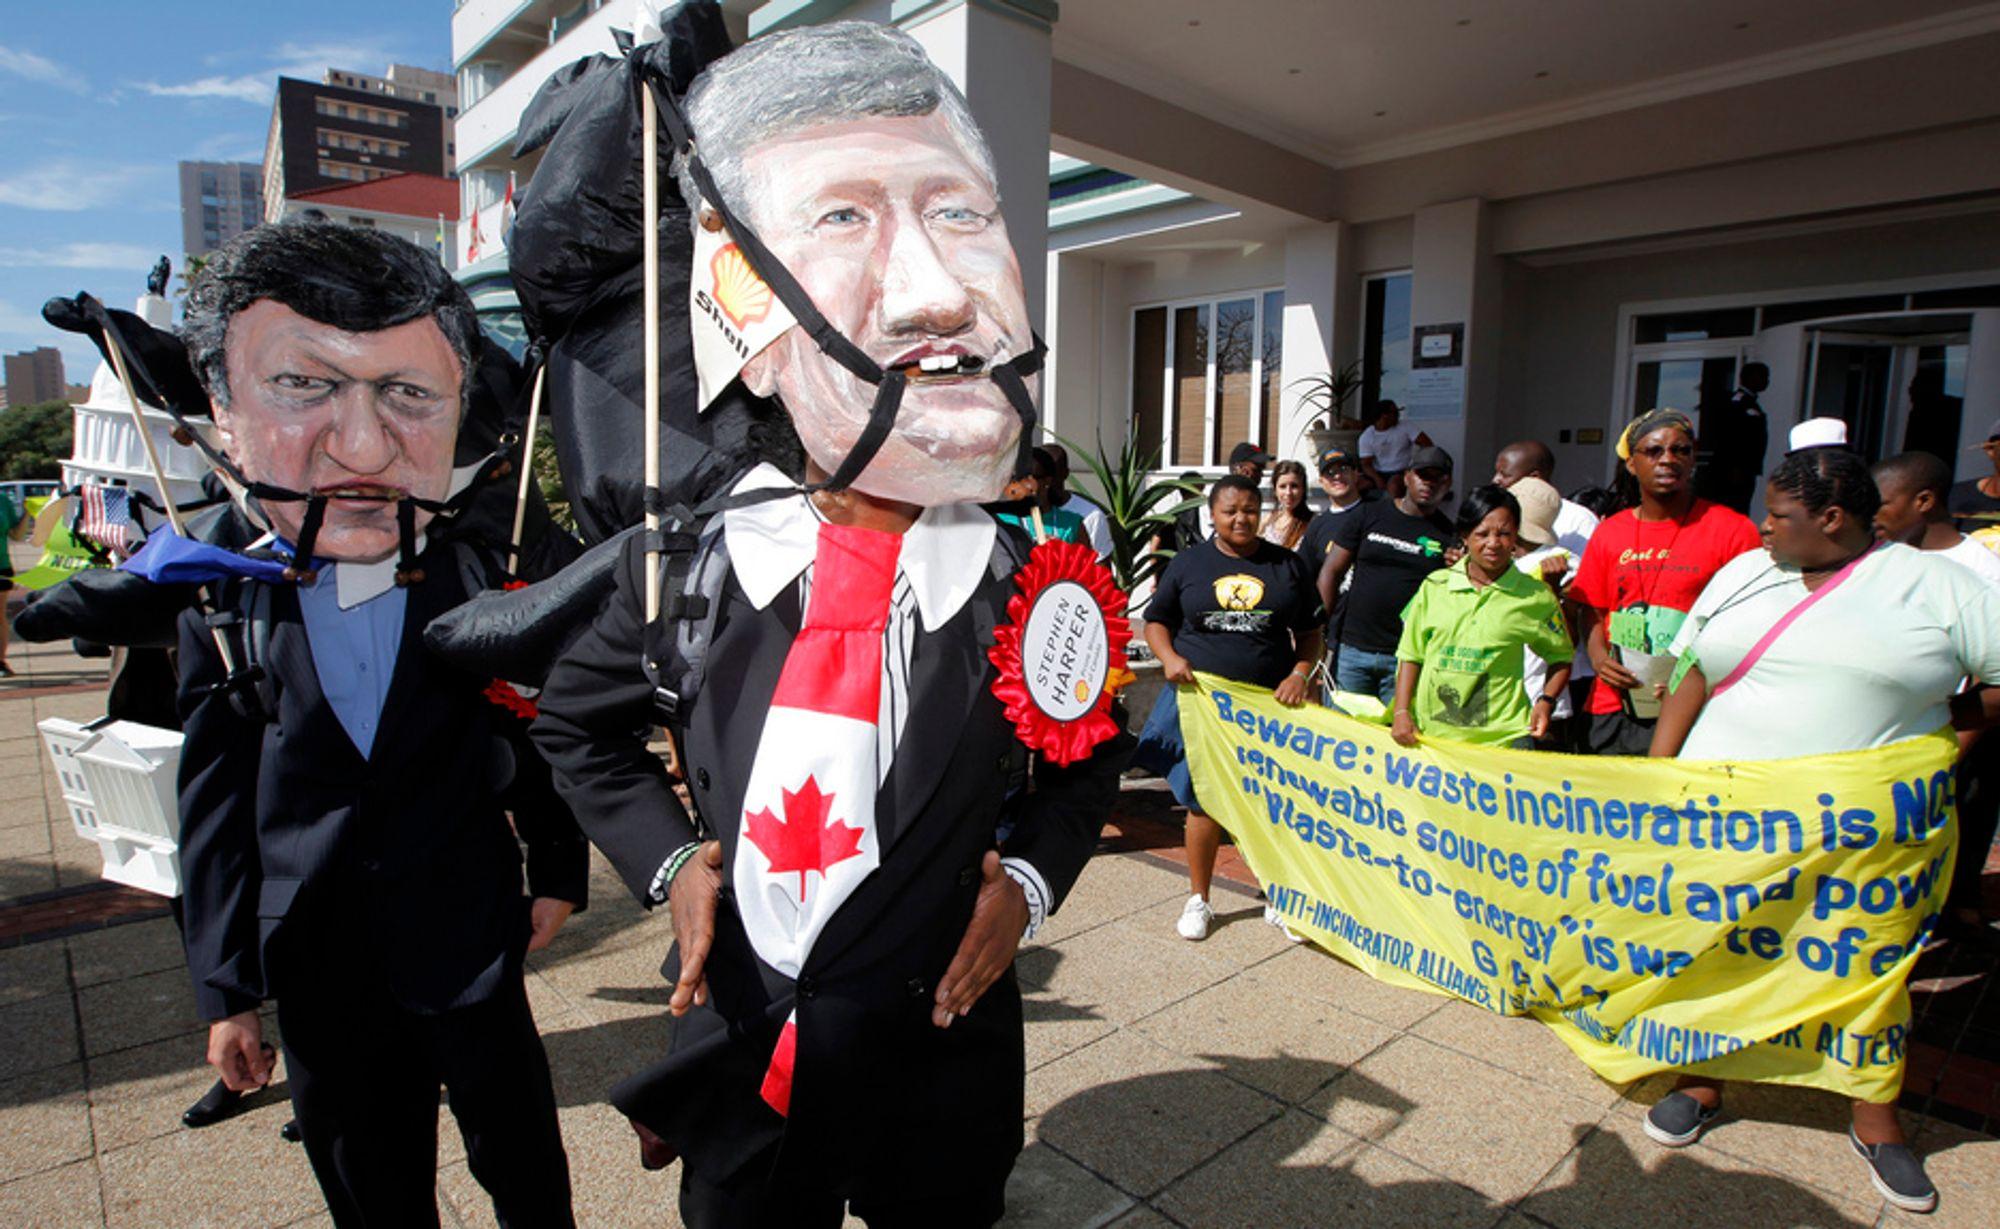 COP17: Klimademonstranter i Durban. Det er fortsatt strid om Kyoto-avtalens framtid.